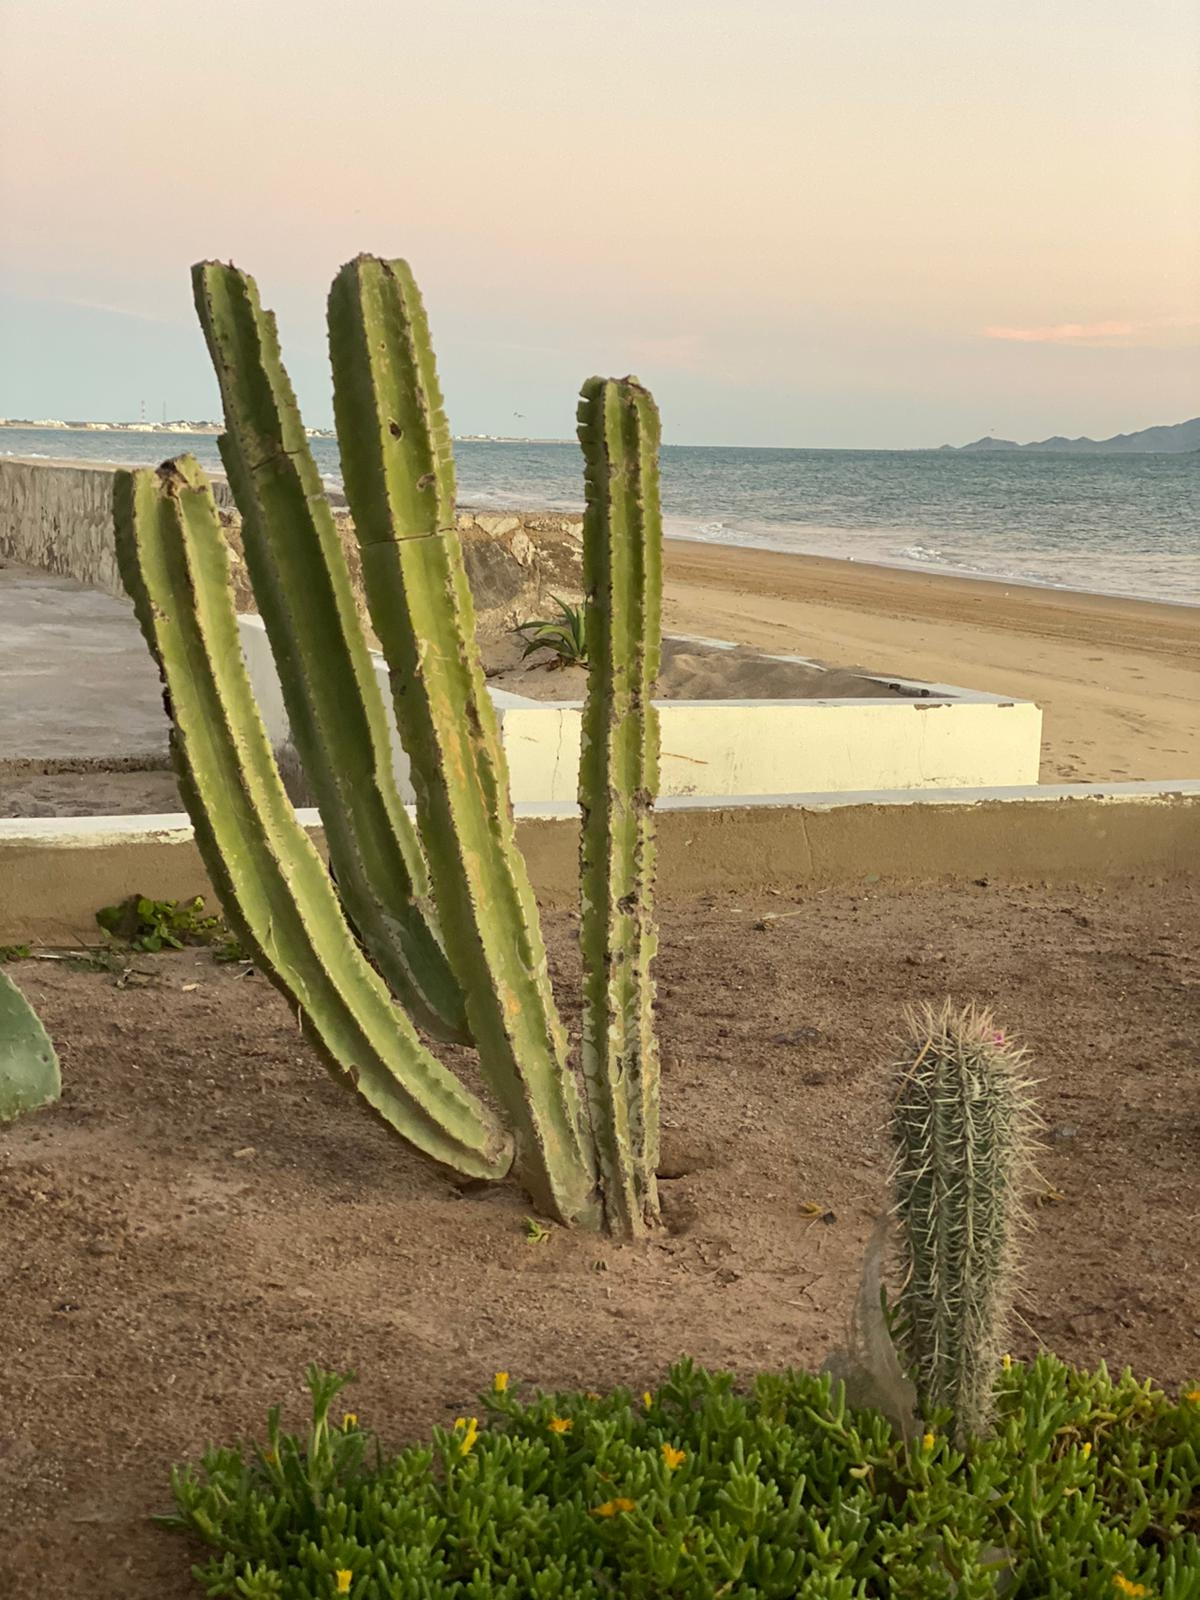 cactus bahía de kino Luis Fernando Heras Portillo